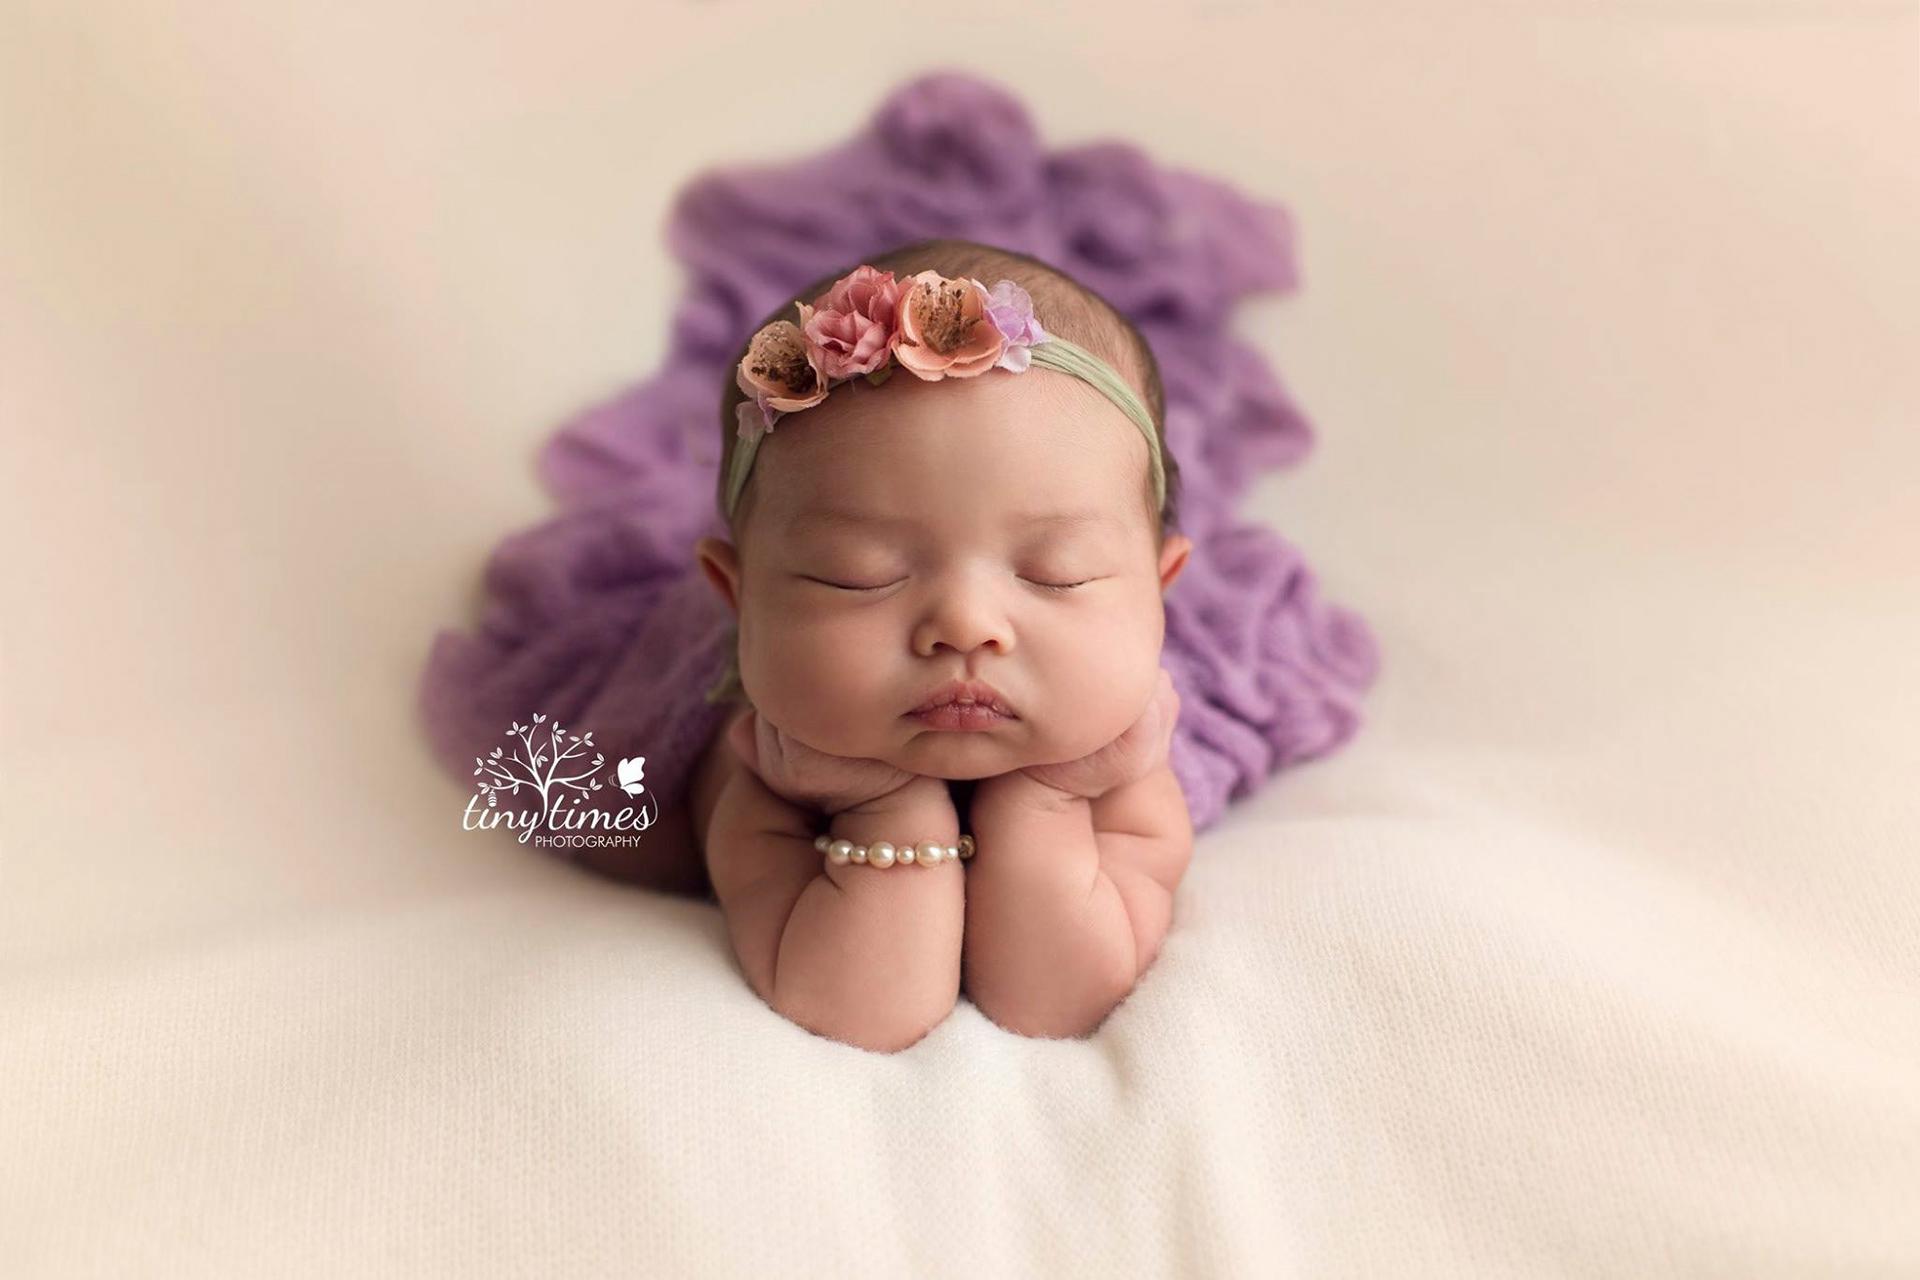 Newborn photography dslr camera